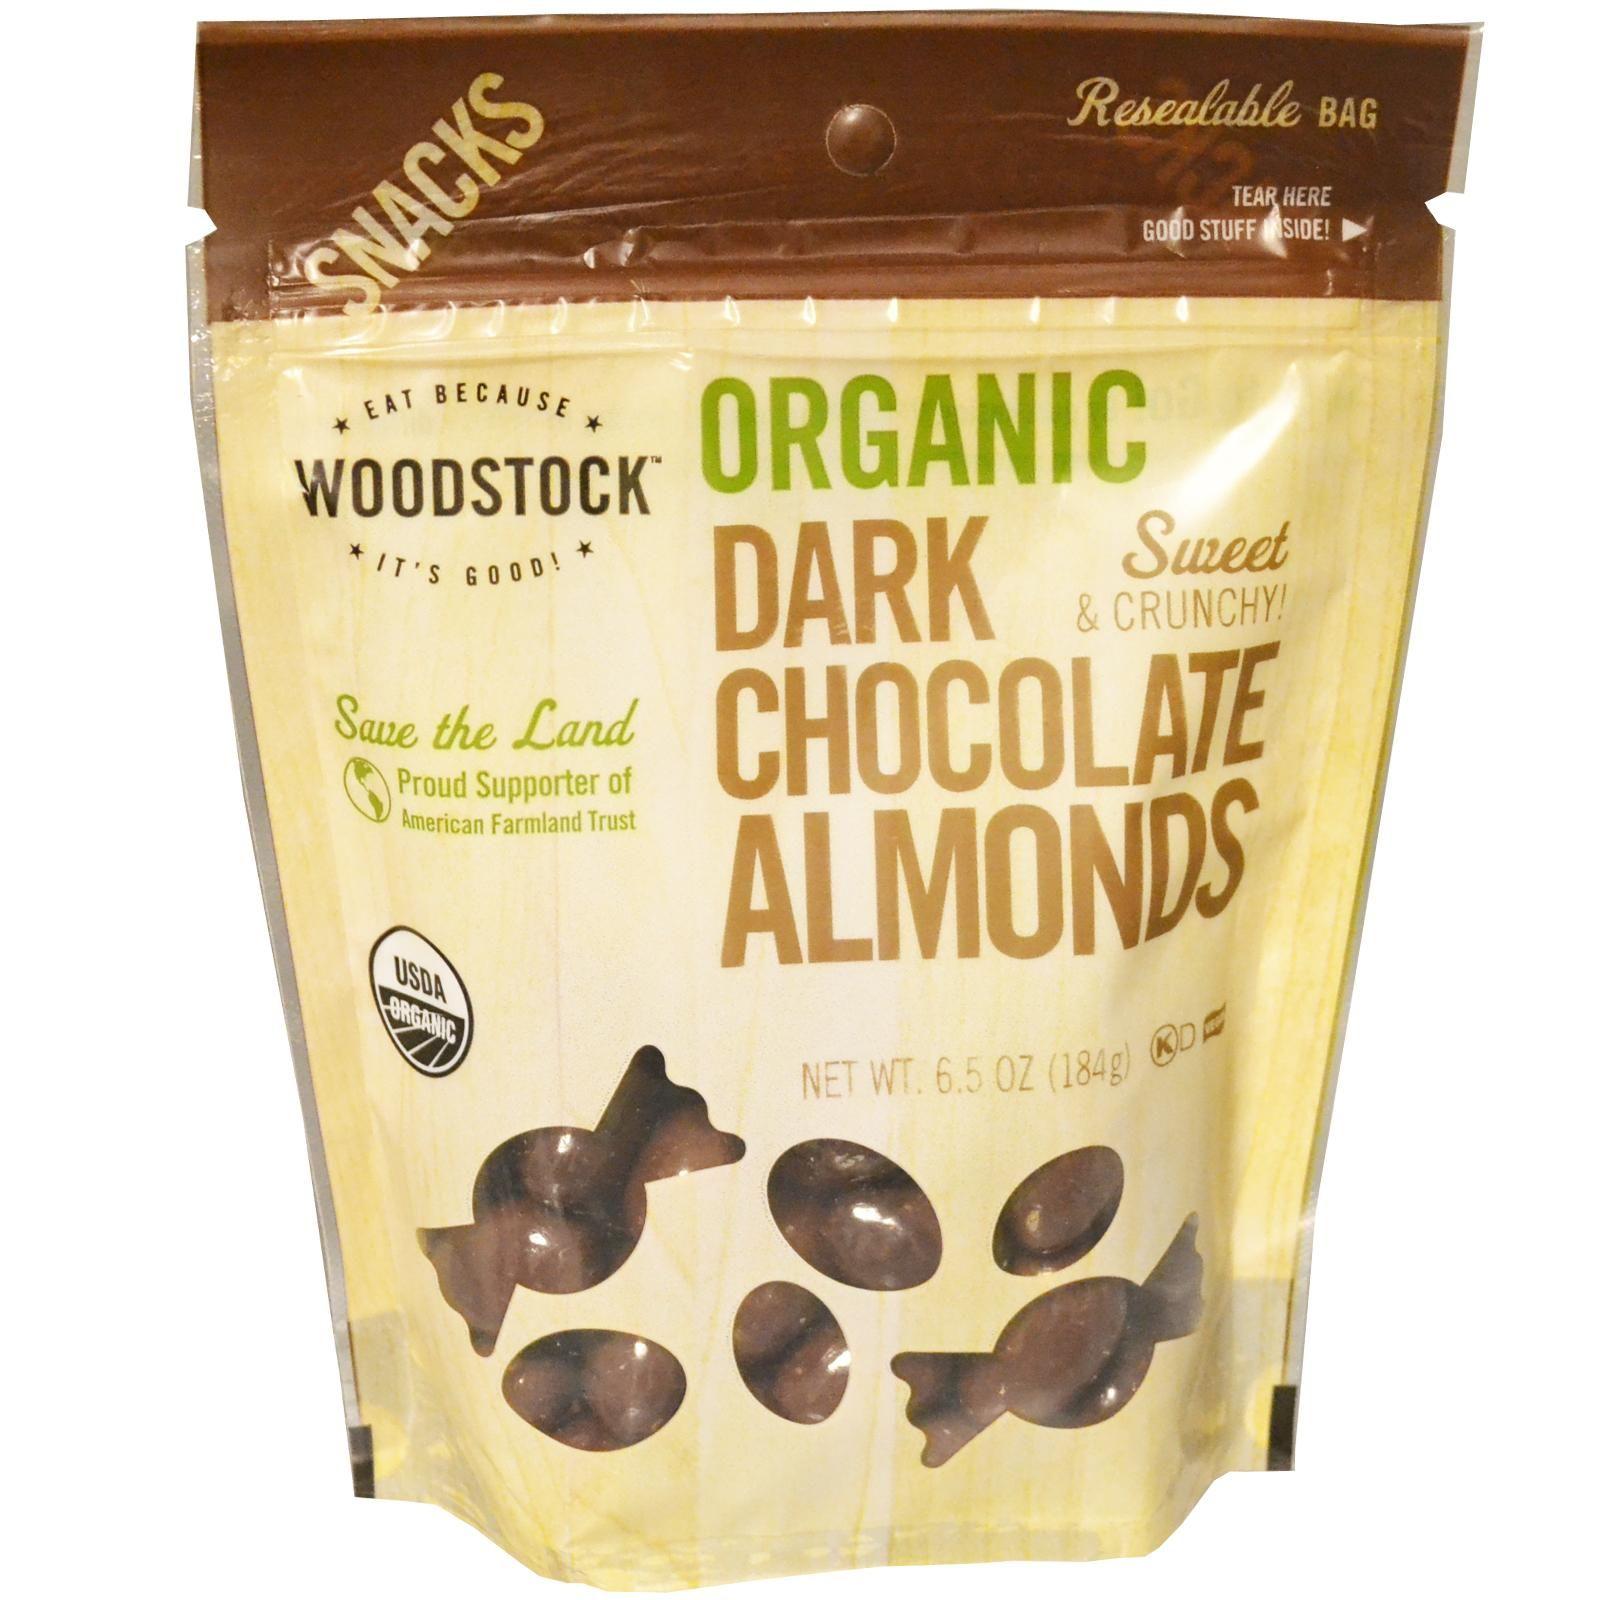 Woodstock dark chocolate almonds | Dark chocolate almonds ...